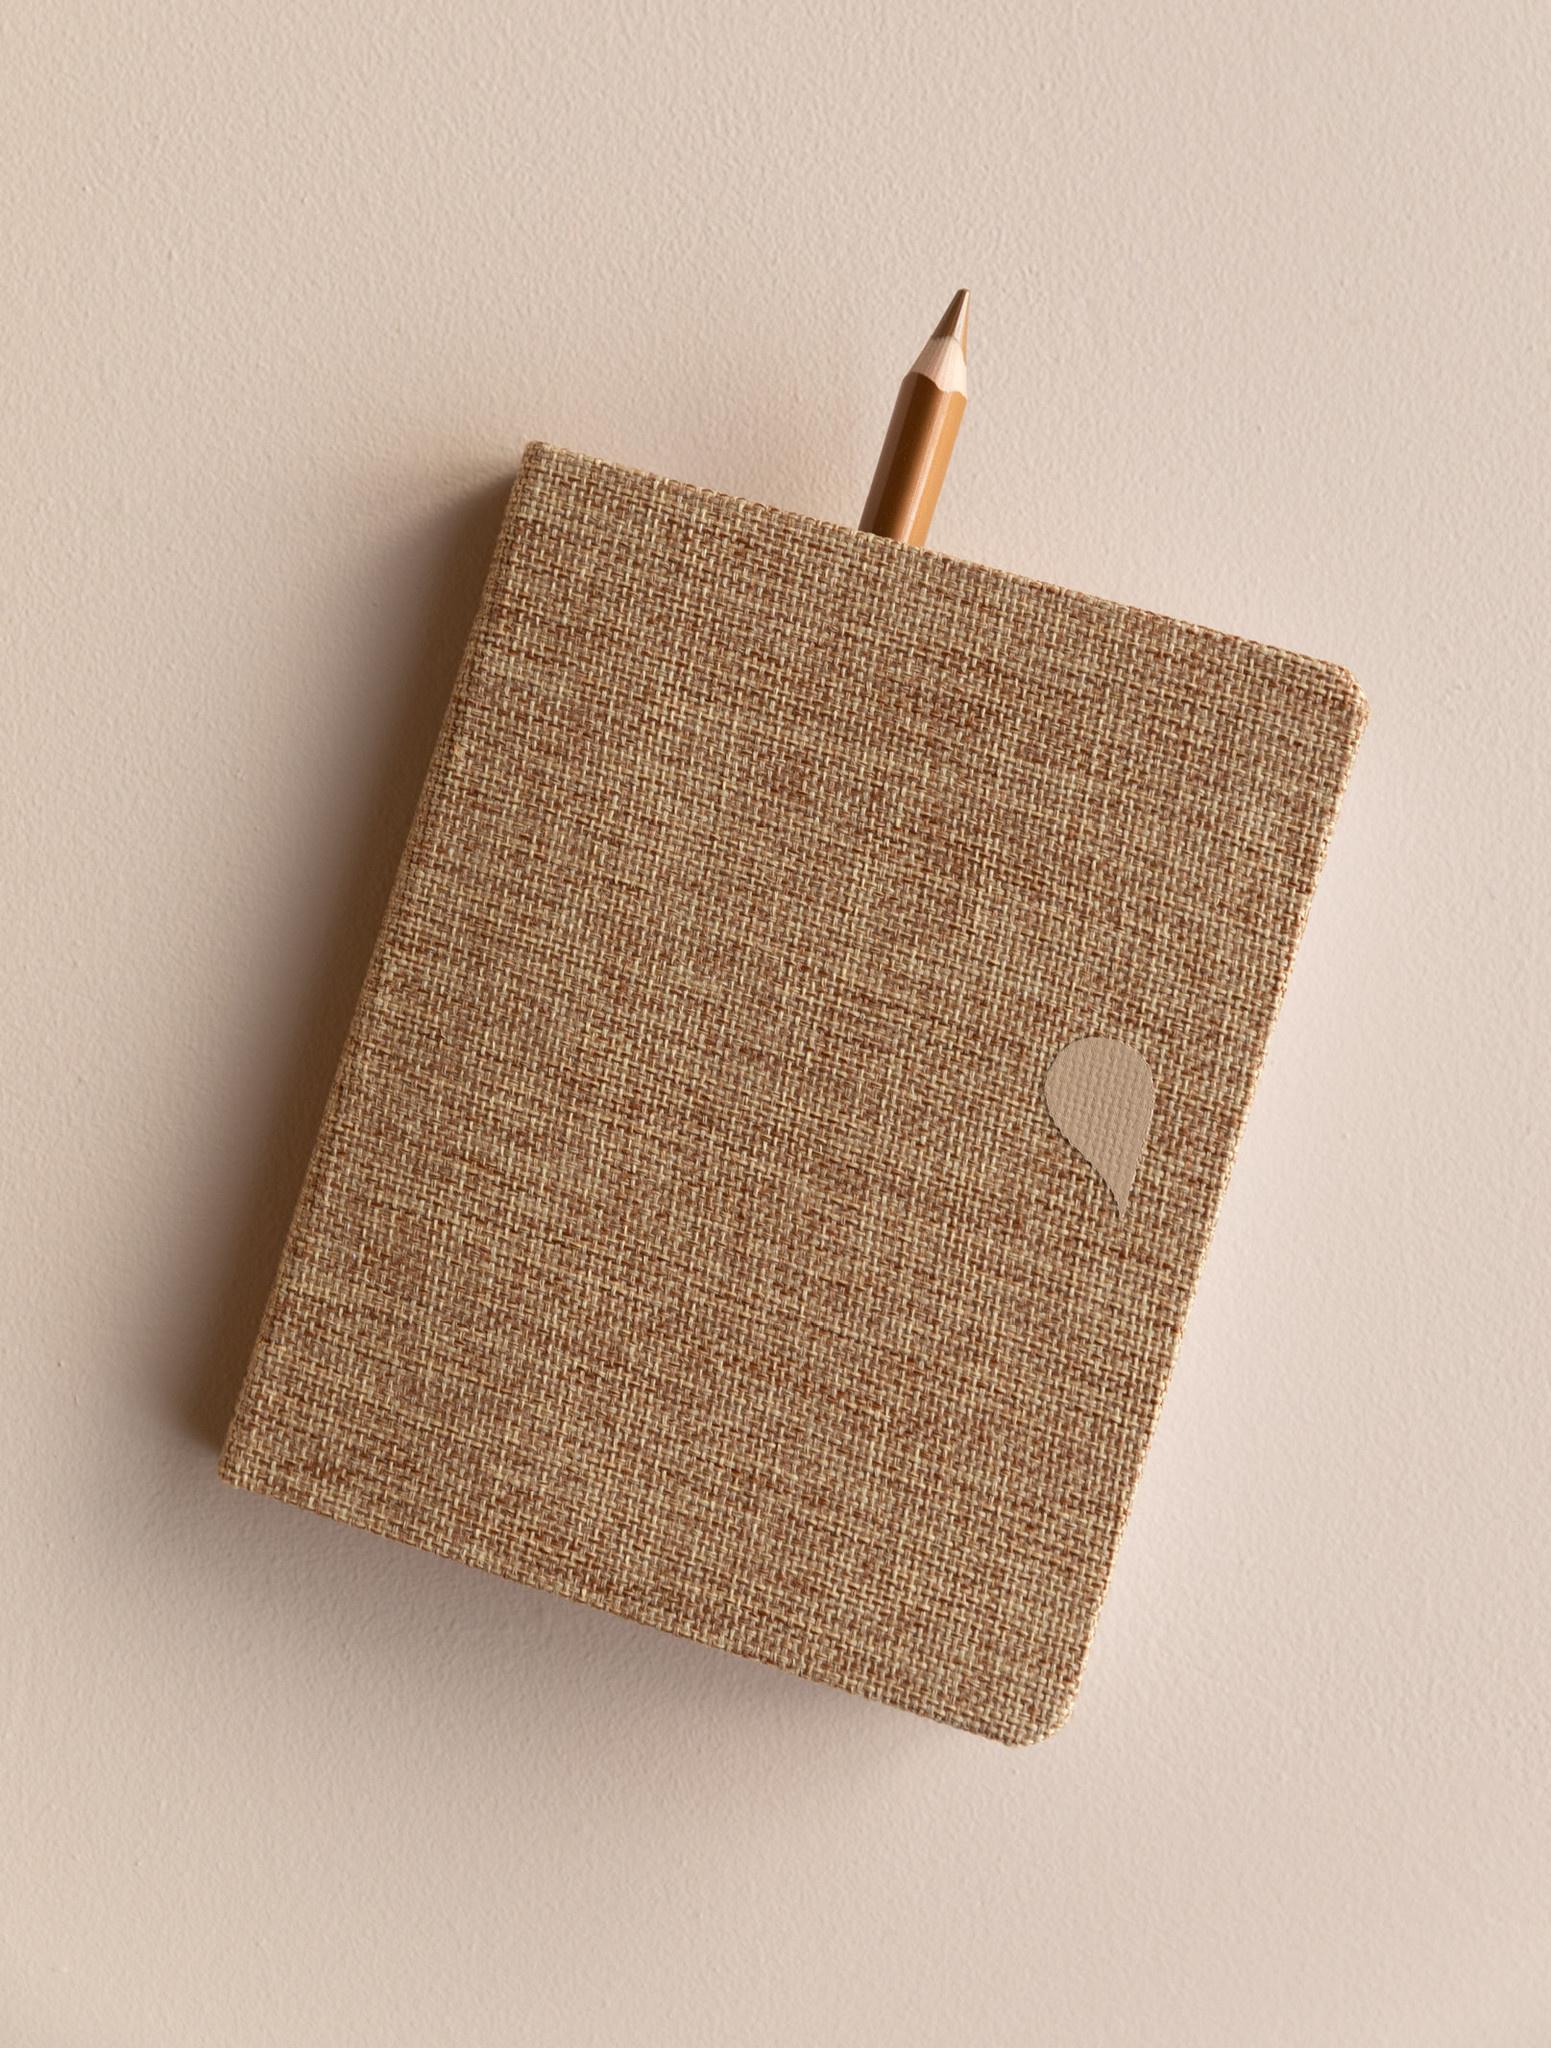 Notebook A6 - Fluorite (5 stuks)-1